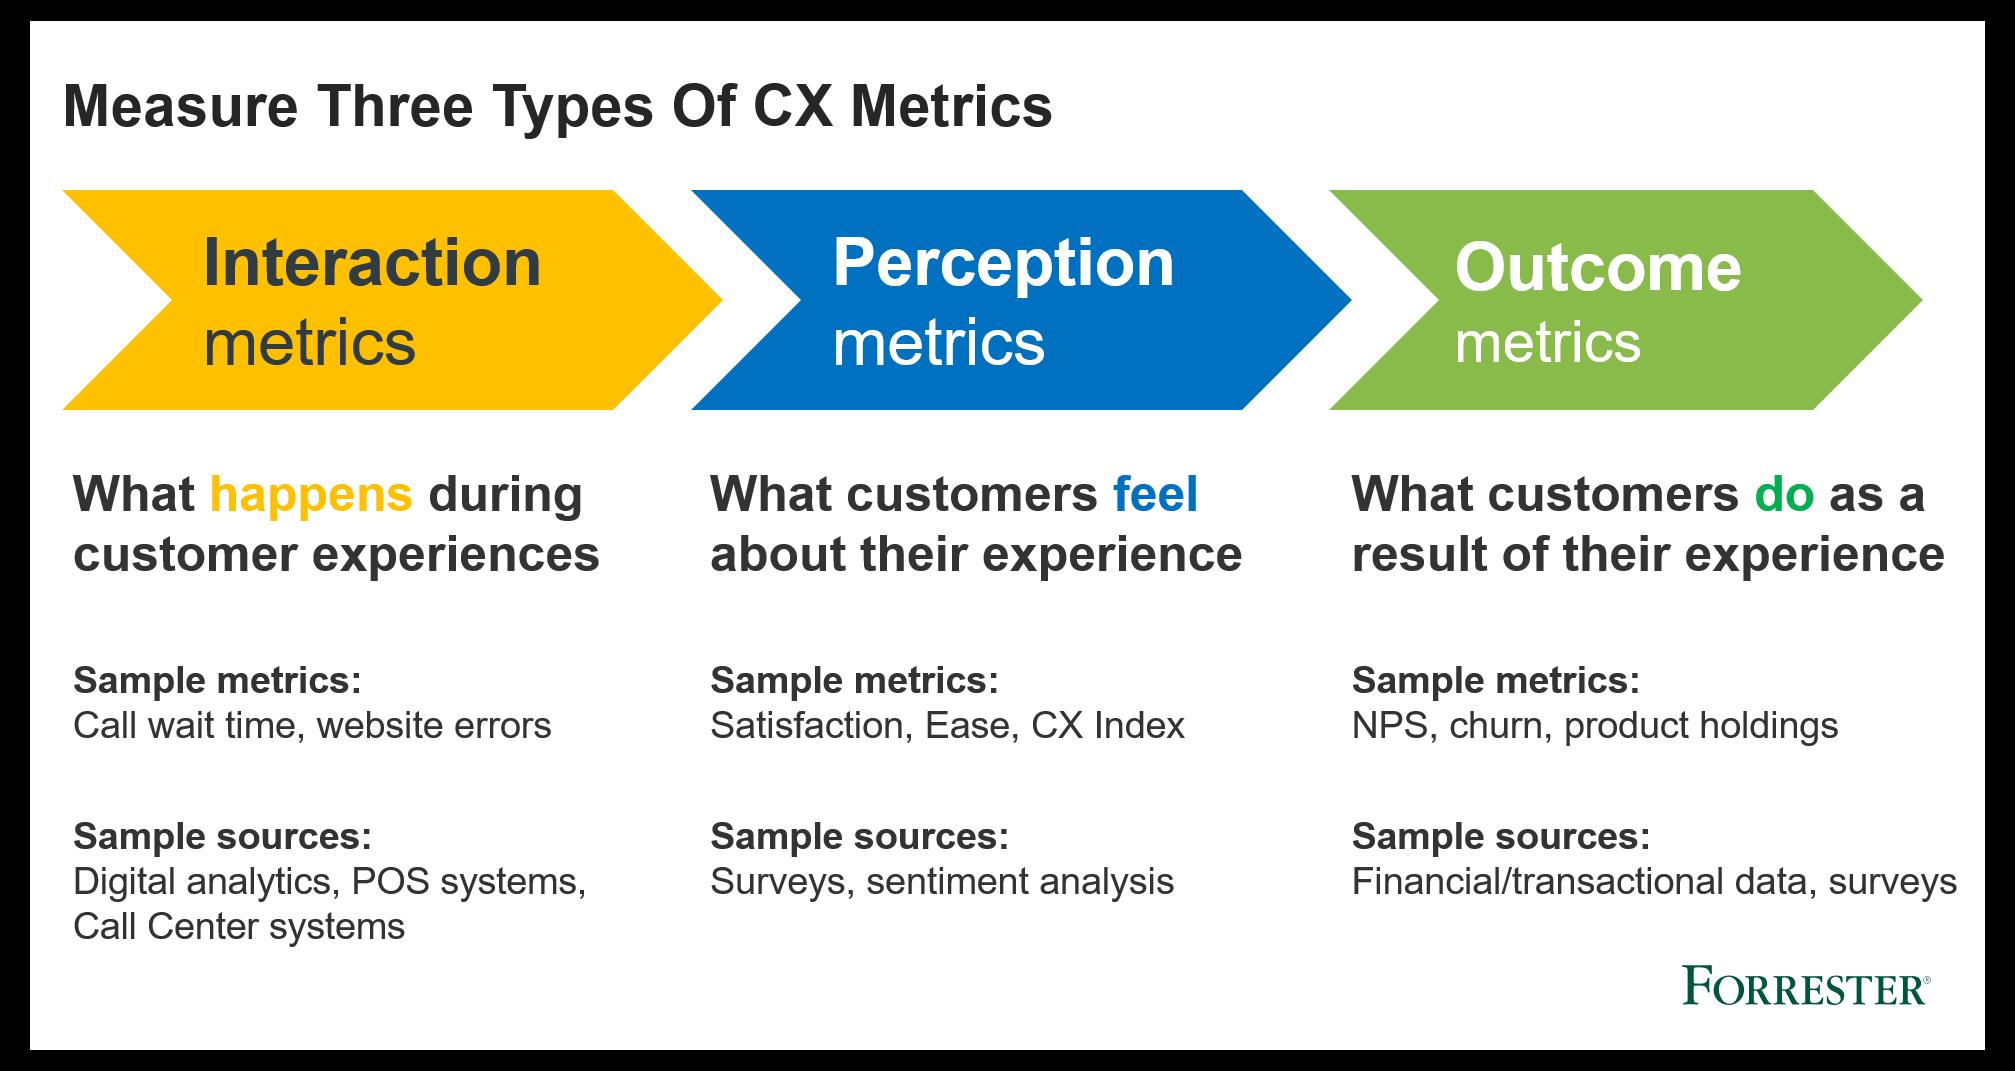 CX measurement programs need perception metrics, interaction metrics and outome metrics